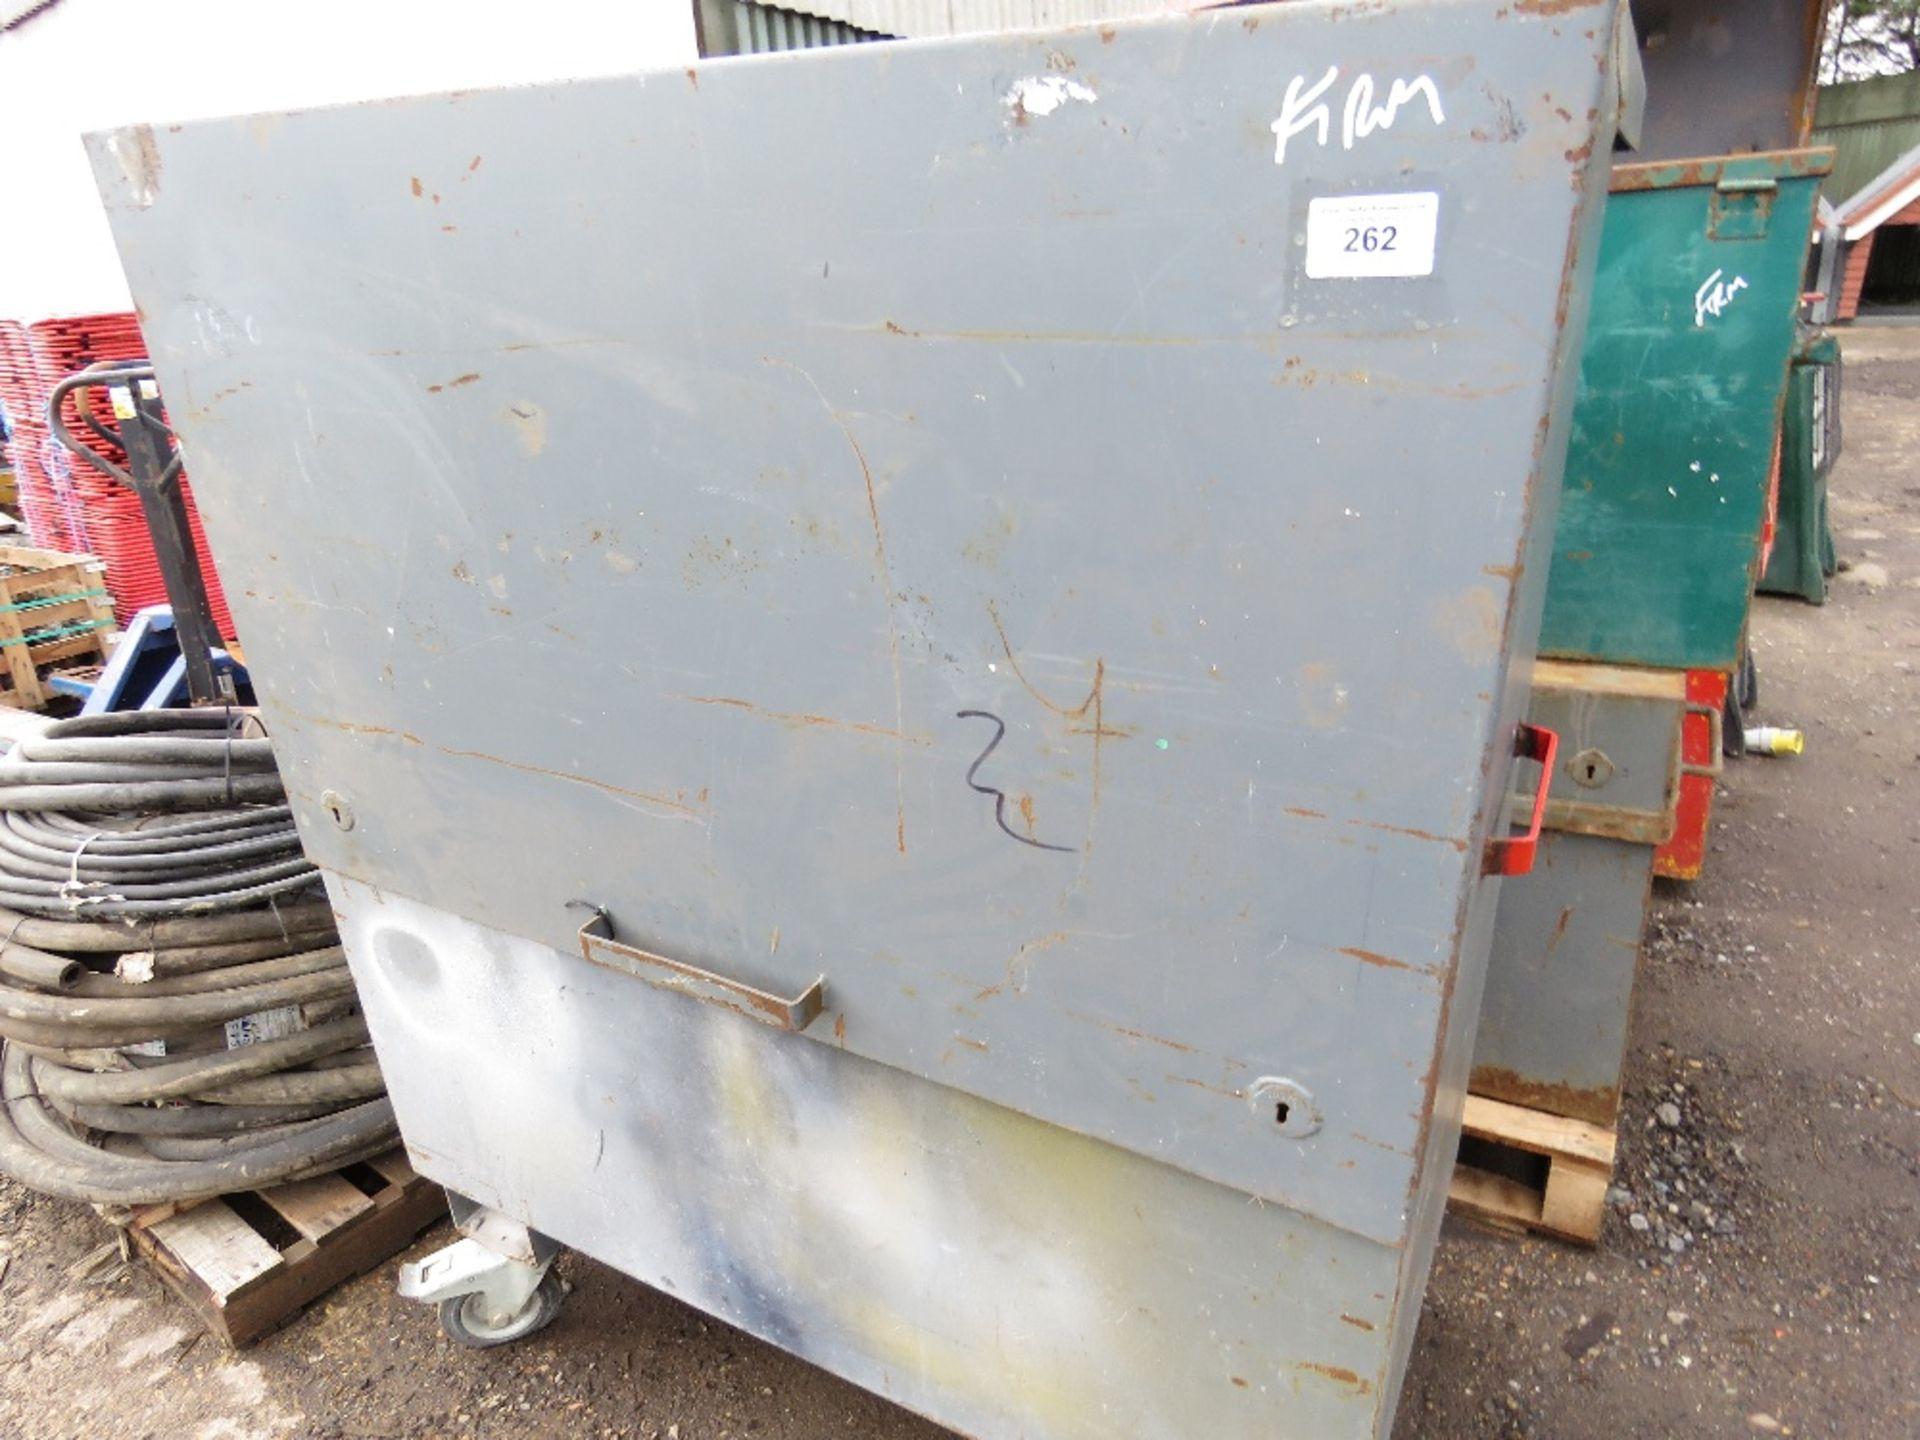 Lot 262 - Large wheeled tool safe, no keys